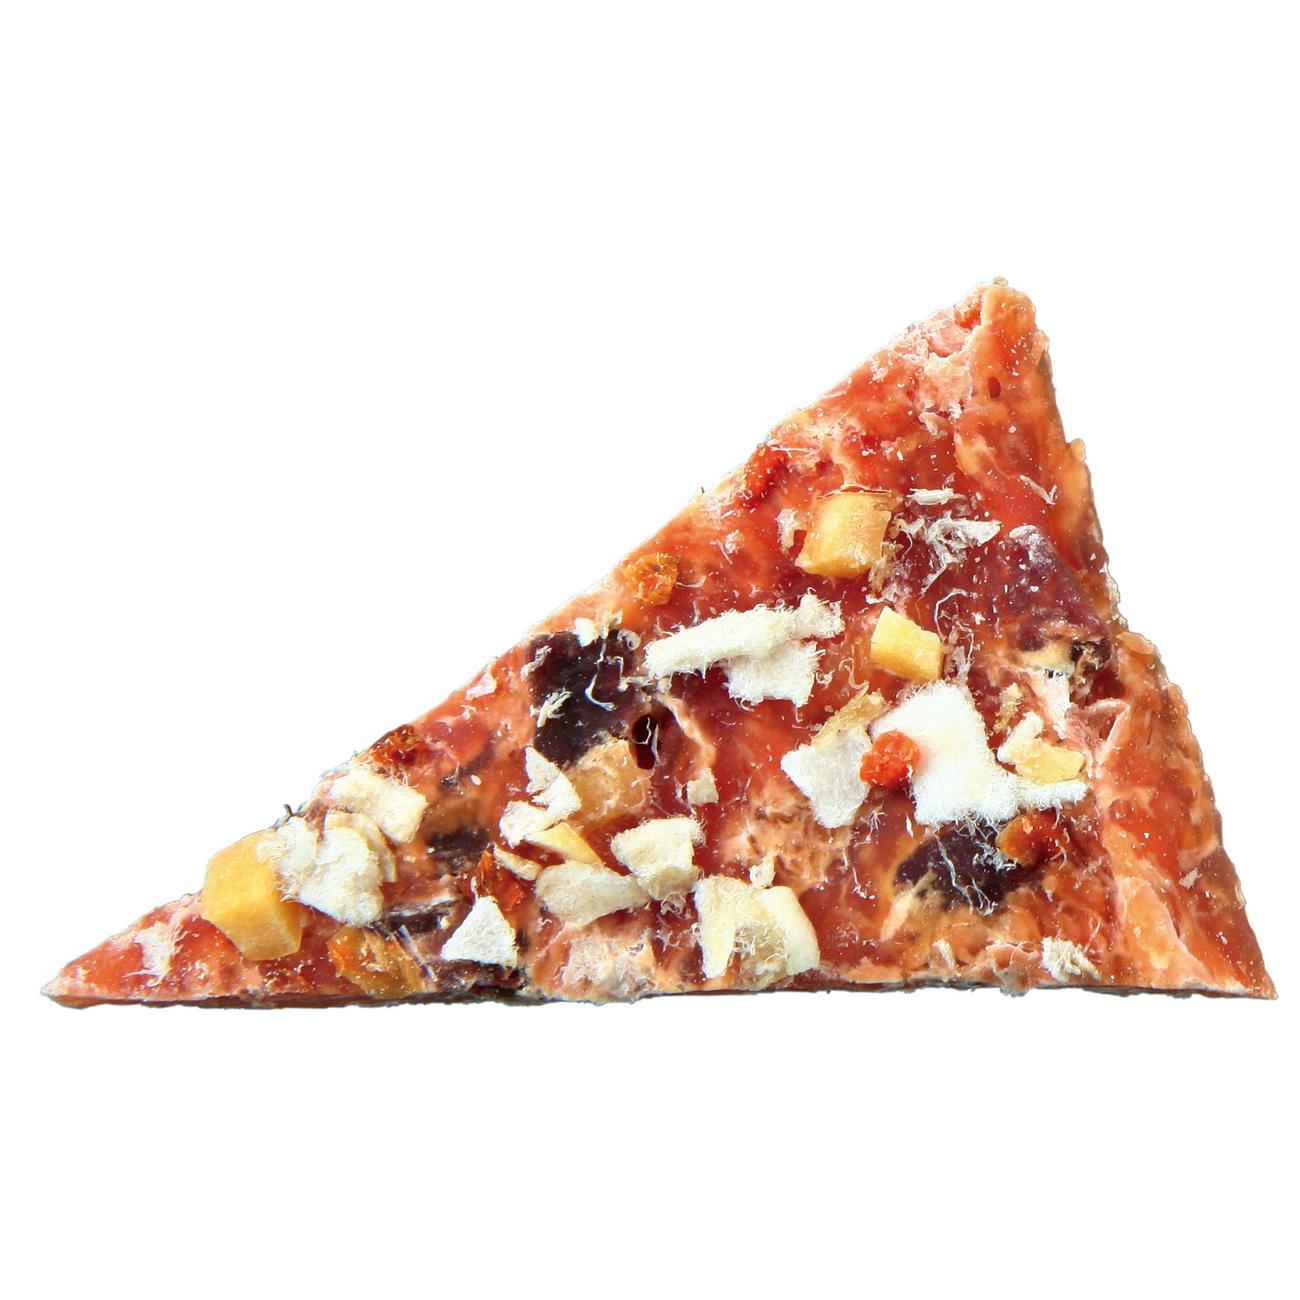 Trixie Premio Chicken Pizza Hundesnack 31702, Bild 2